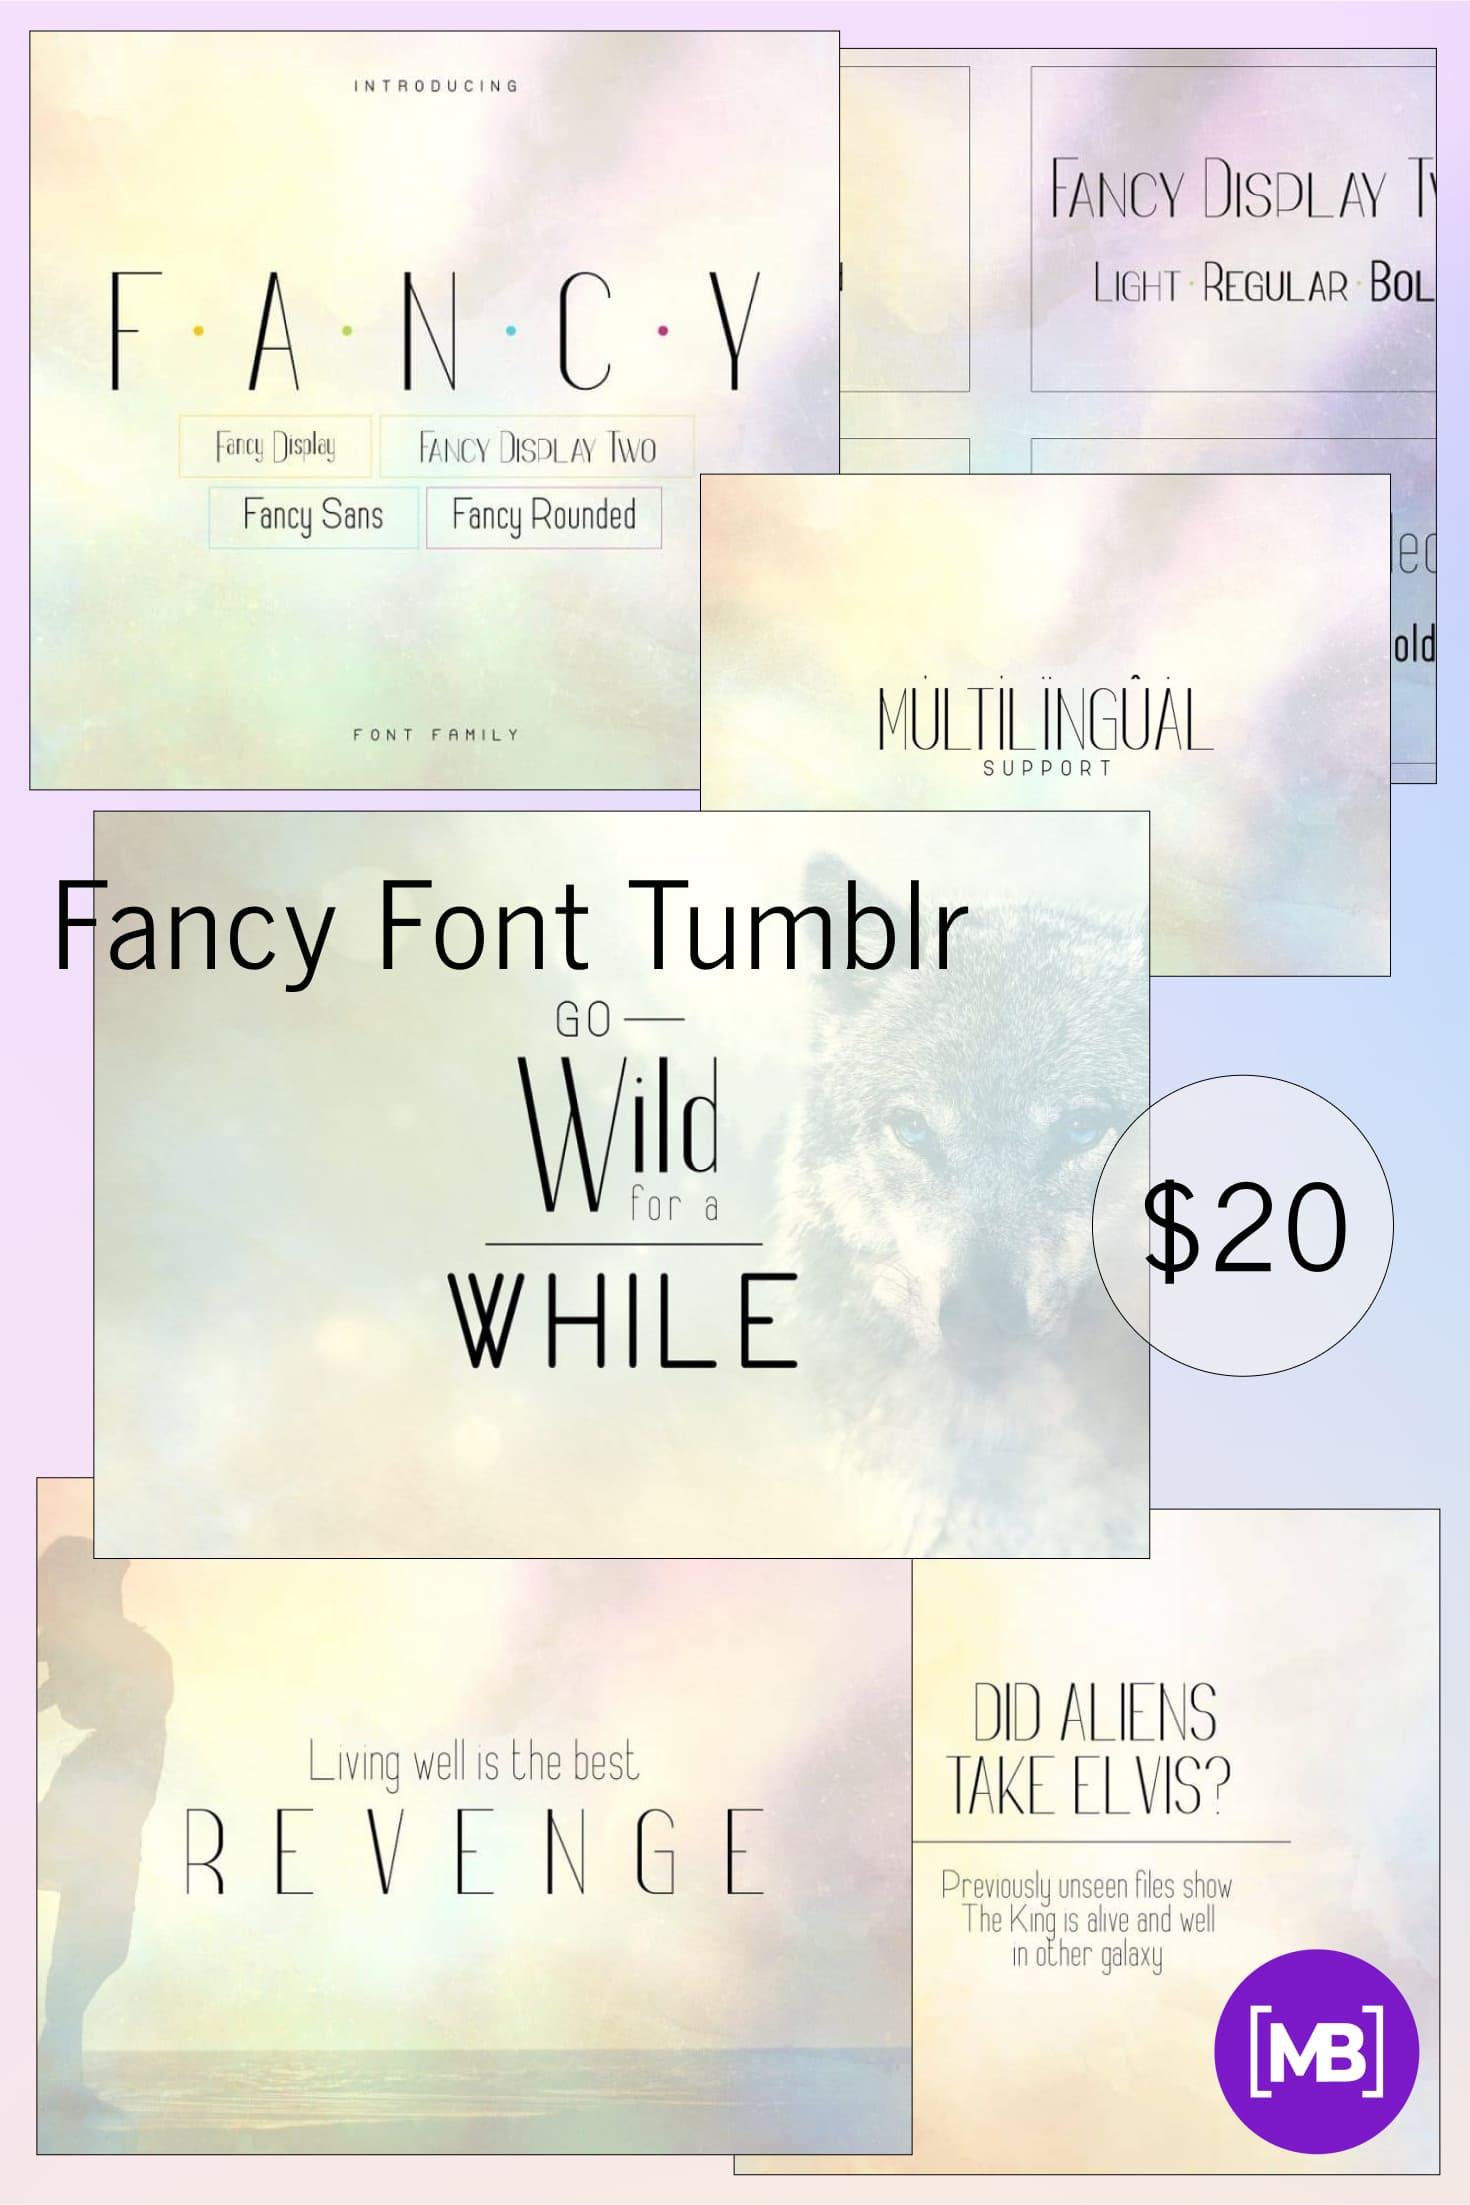 Pinterest Image: Fancy Font Tumblr  - font family 12 items | -50%.